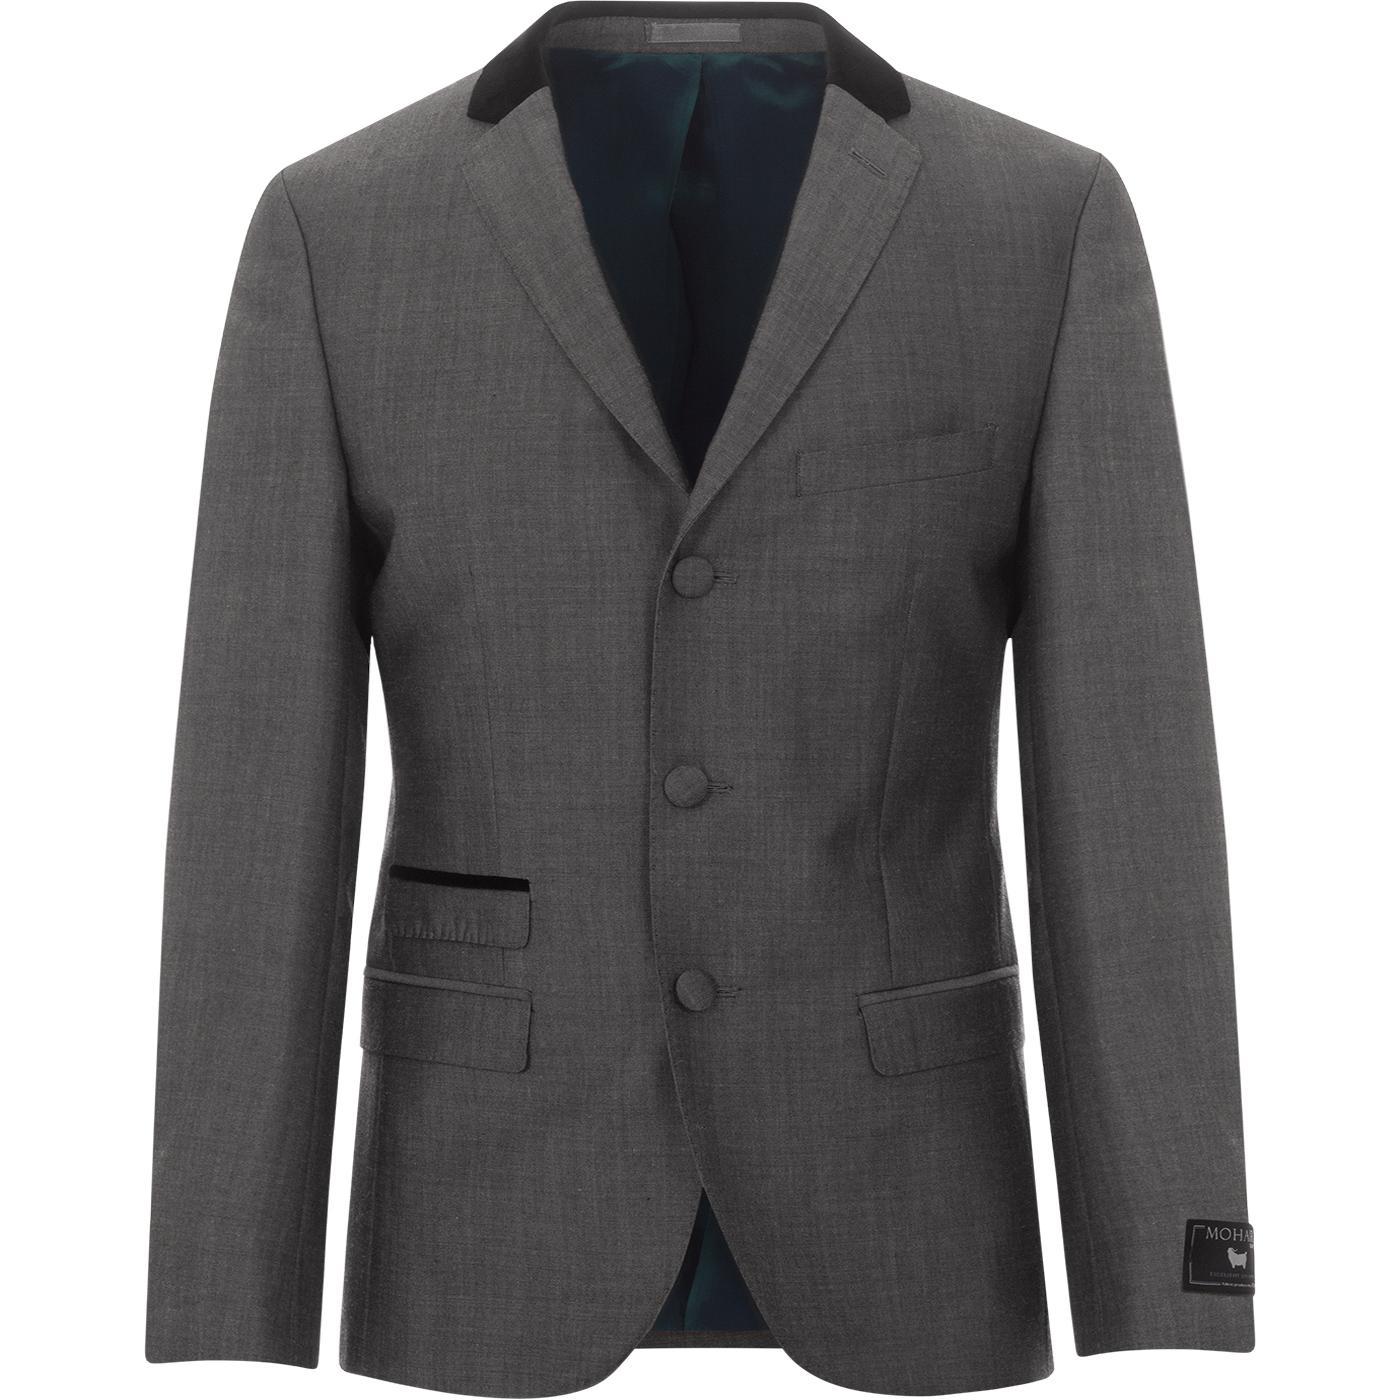 MADCAP ENGLAND Mohair Tonic Velvet Collar Blazer